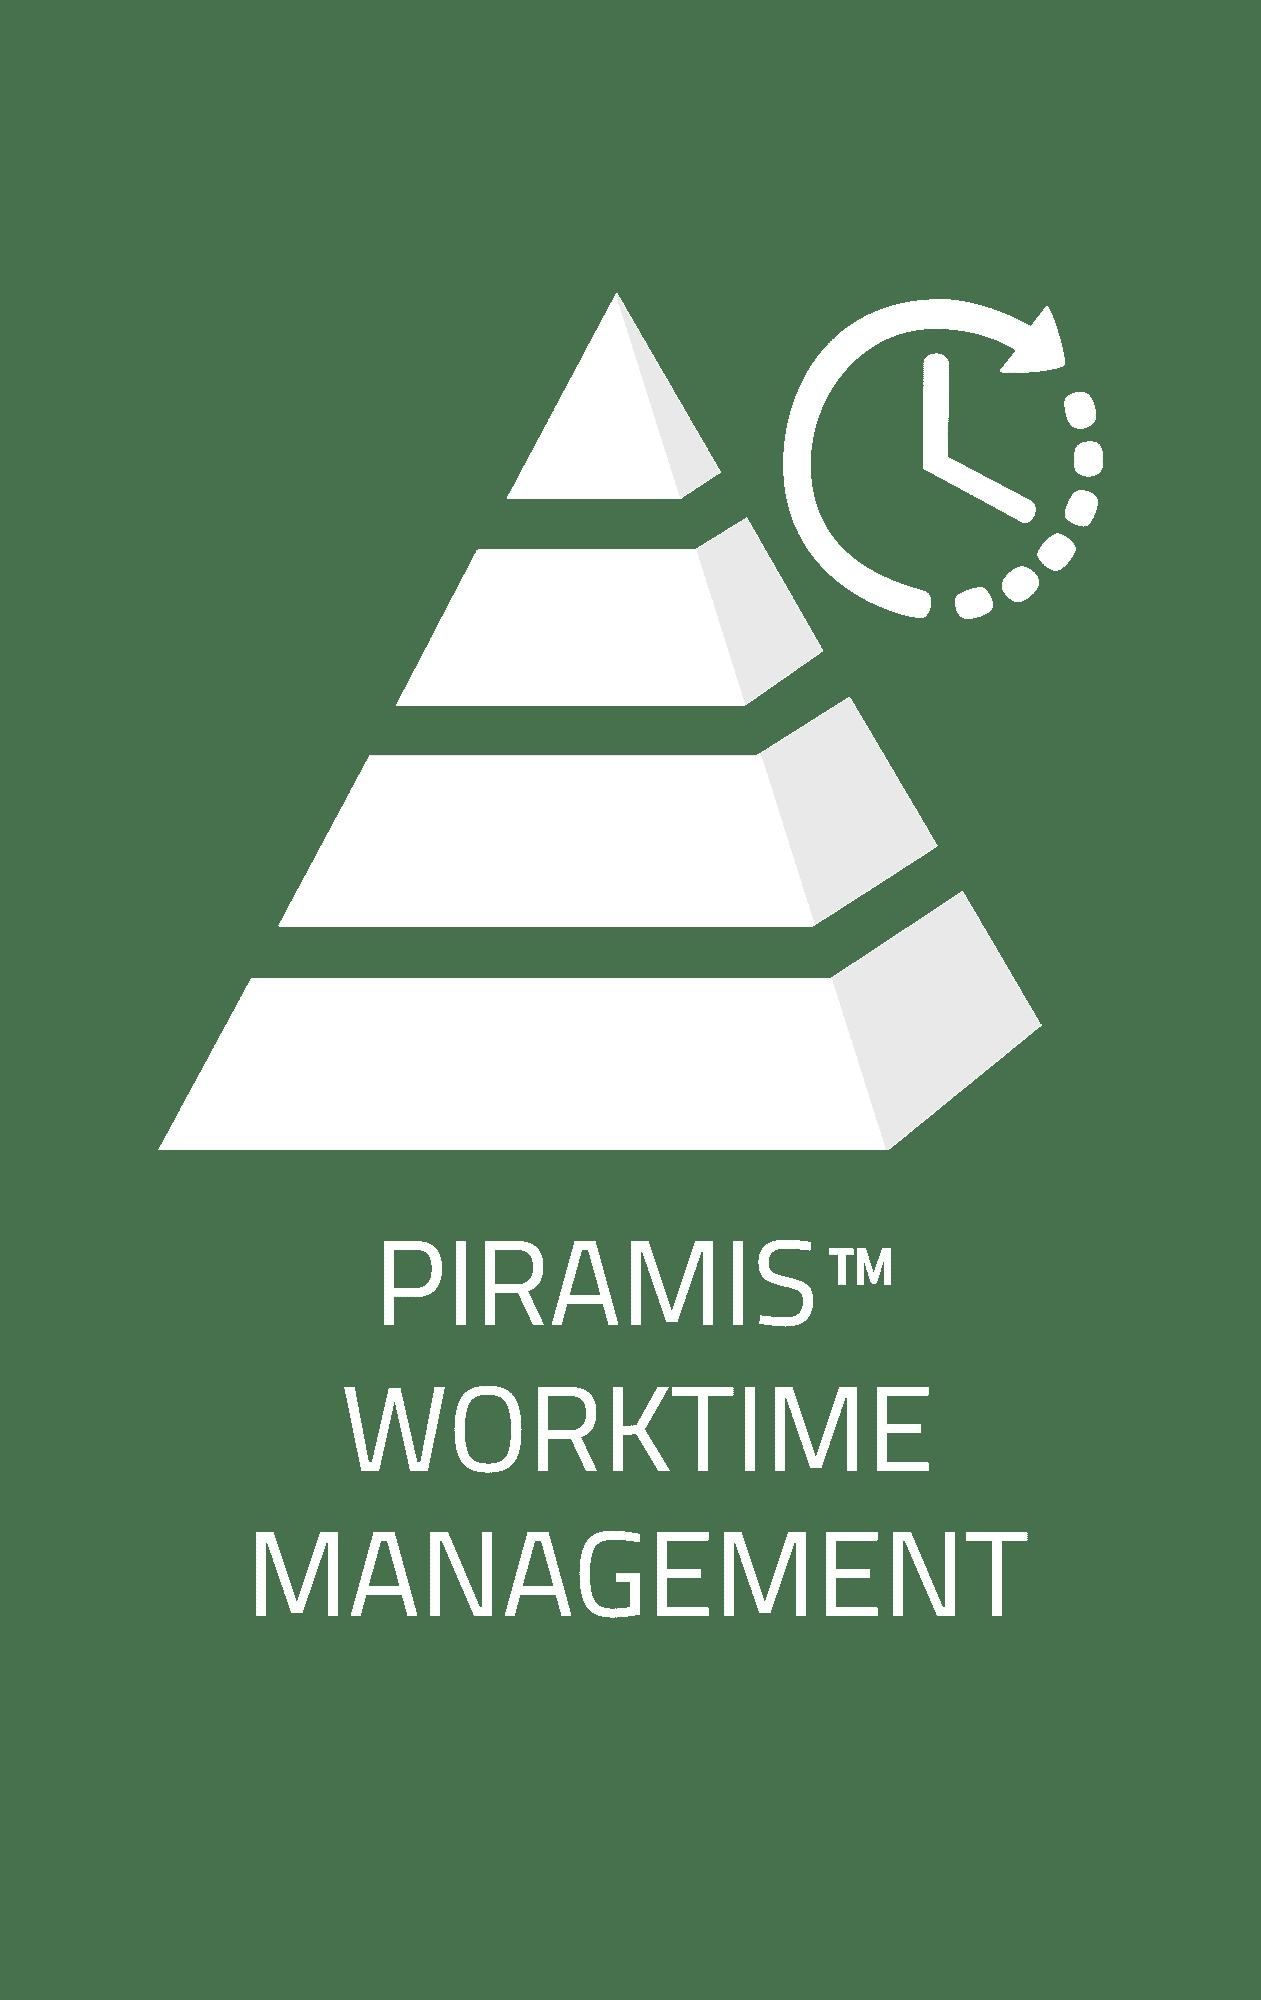 PIRAMIS™ Worktime Management